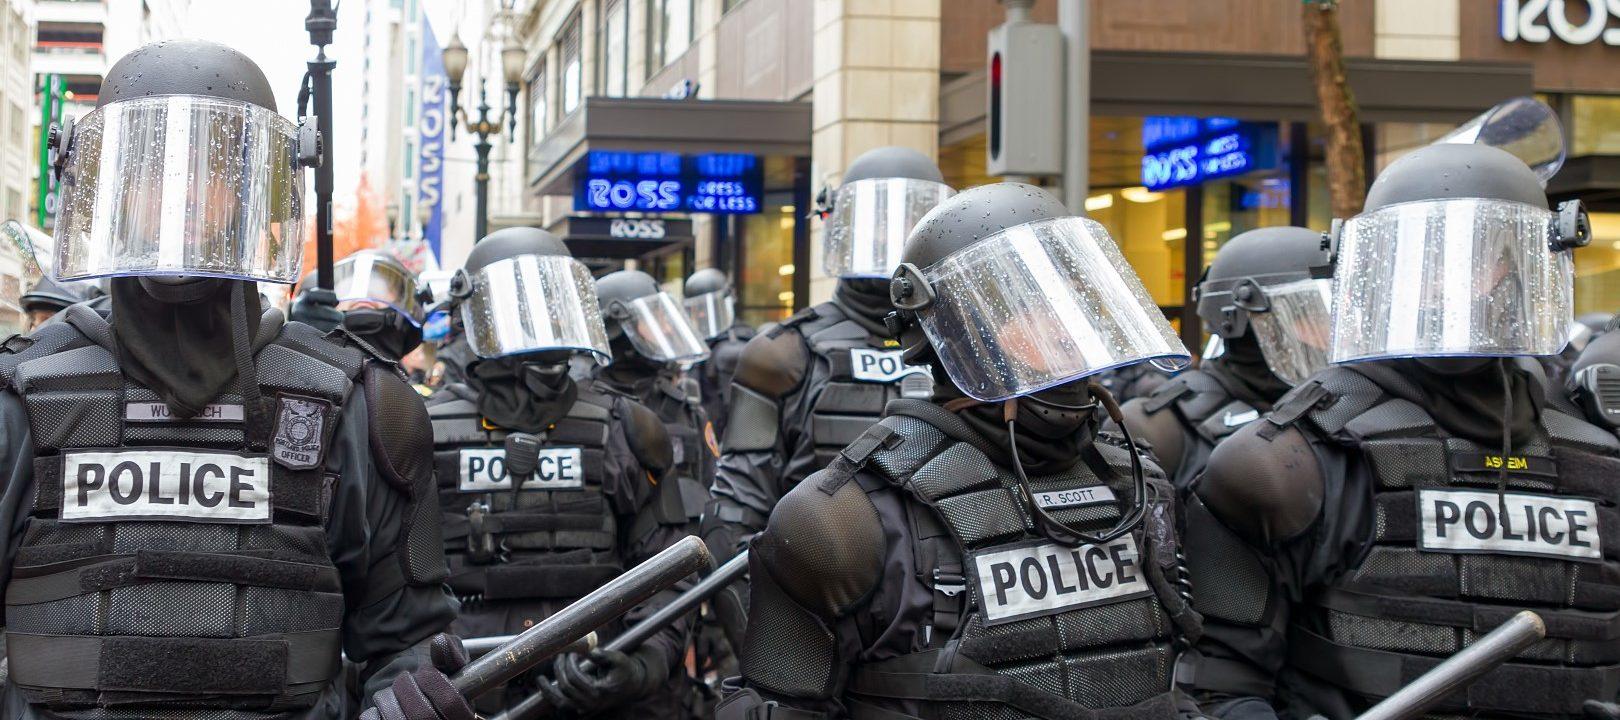 riots-in-America-Large-e1469220570543.jpg